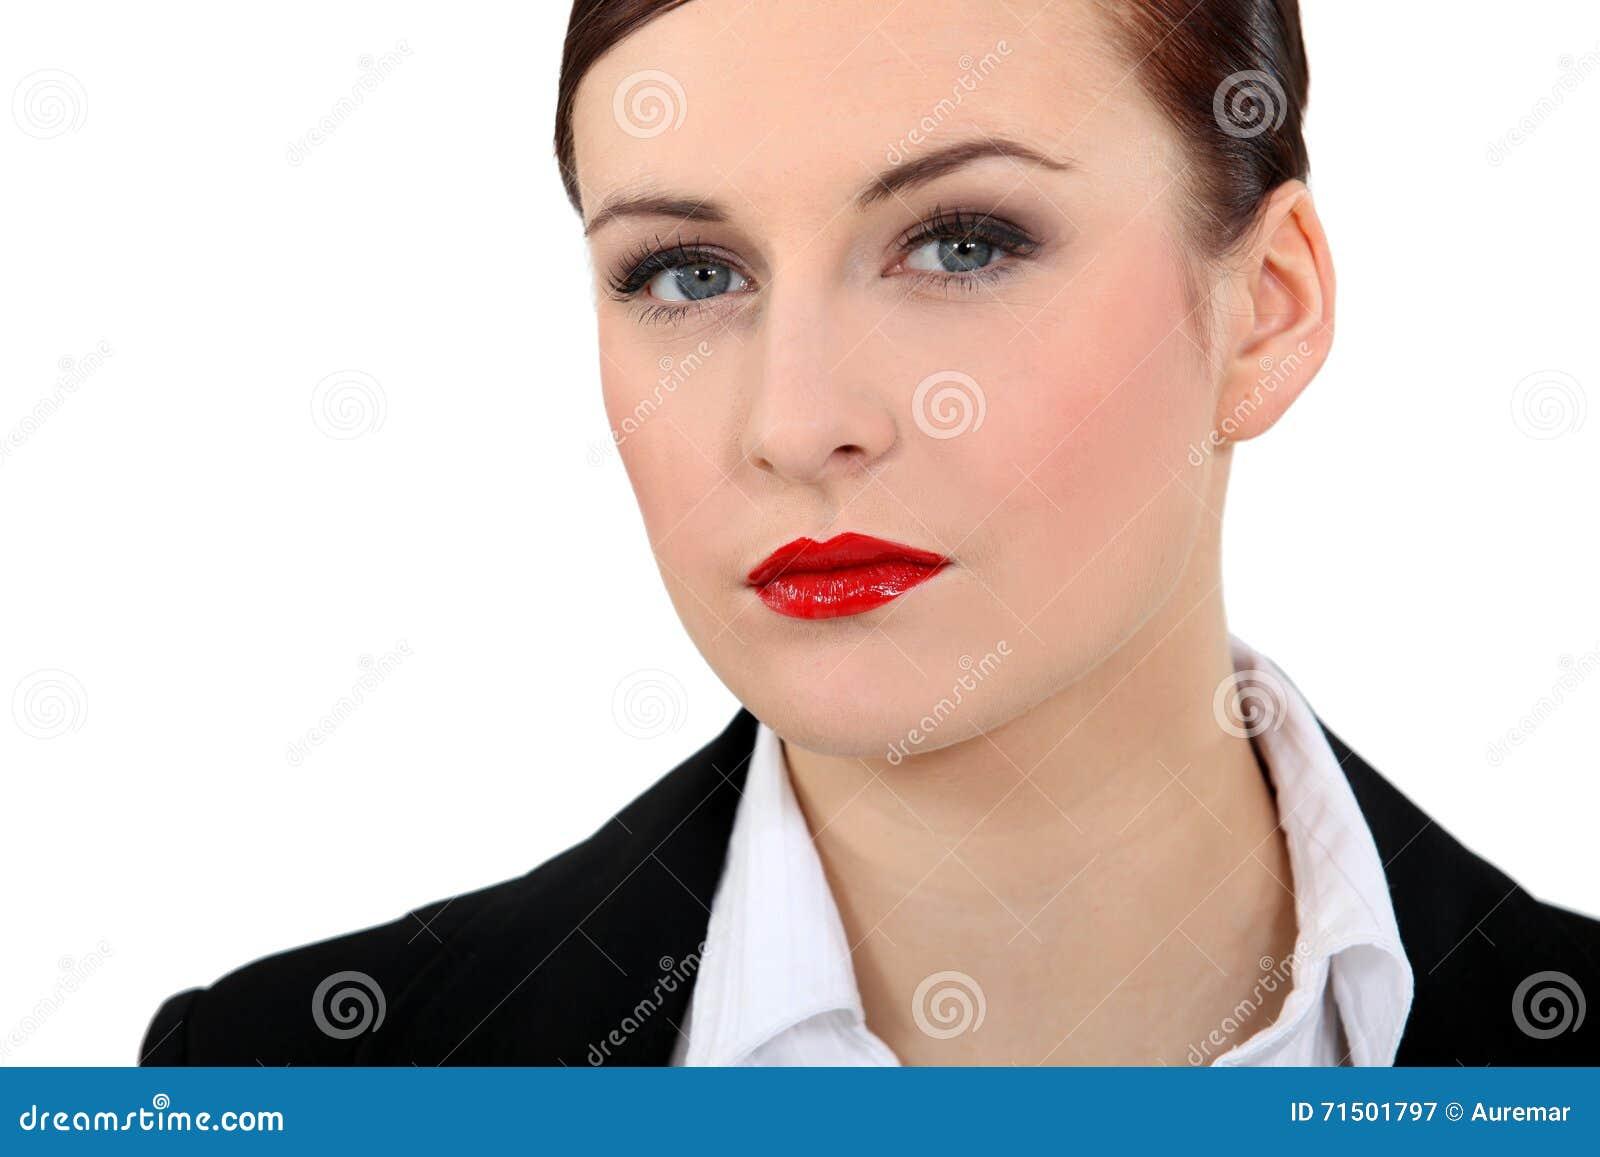 Businesswoman Wearing Red Lipstick Stock Photo - Image: 71501797